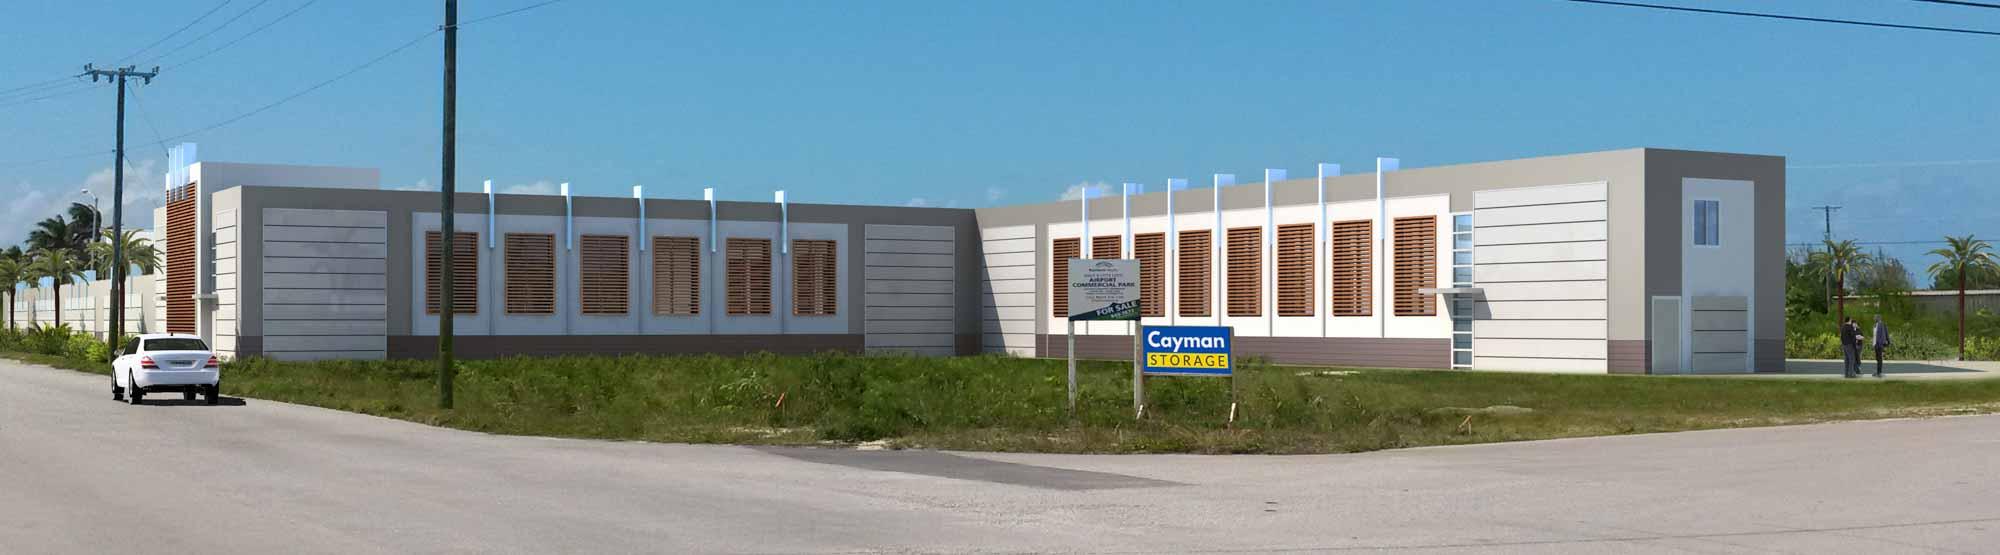 Cayman Storage, the newest, most secure Cayman Island Storage Units